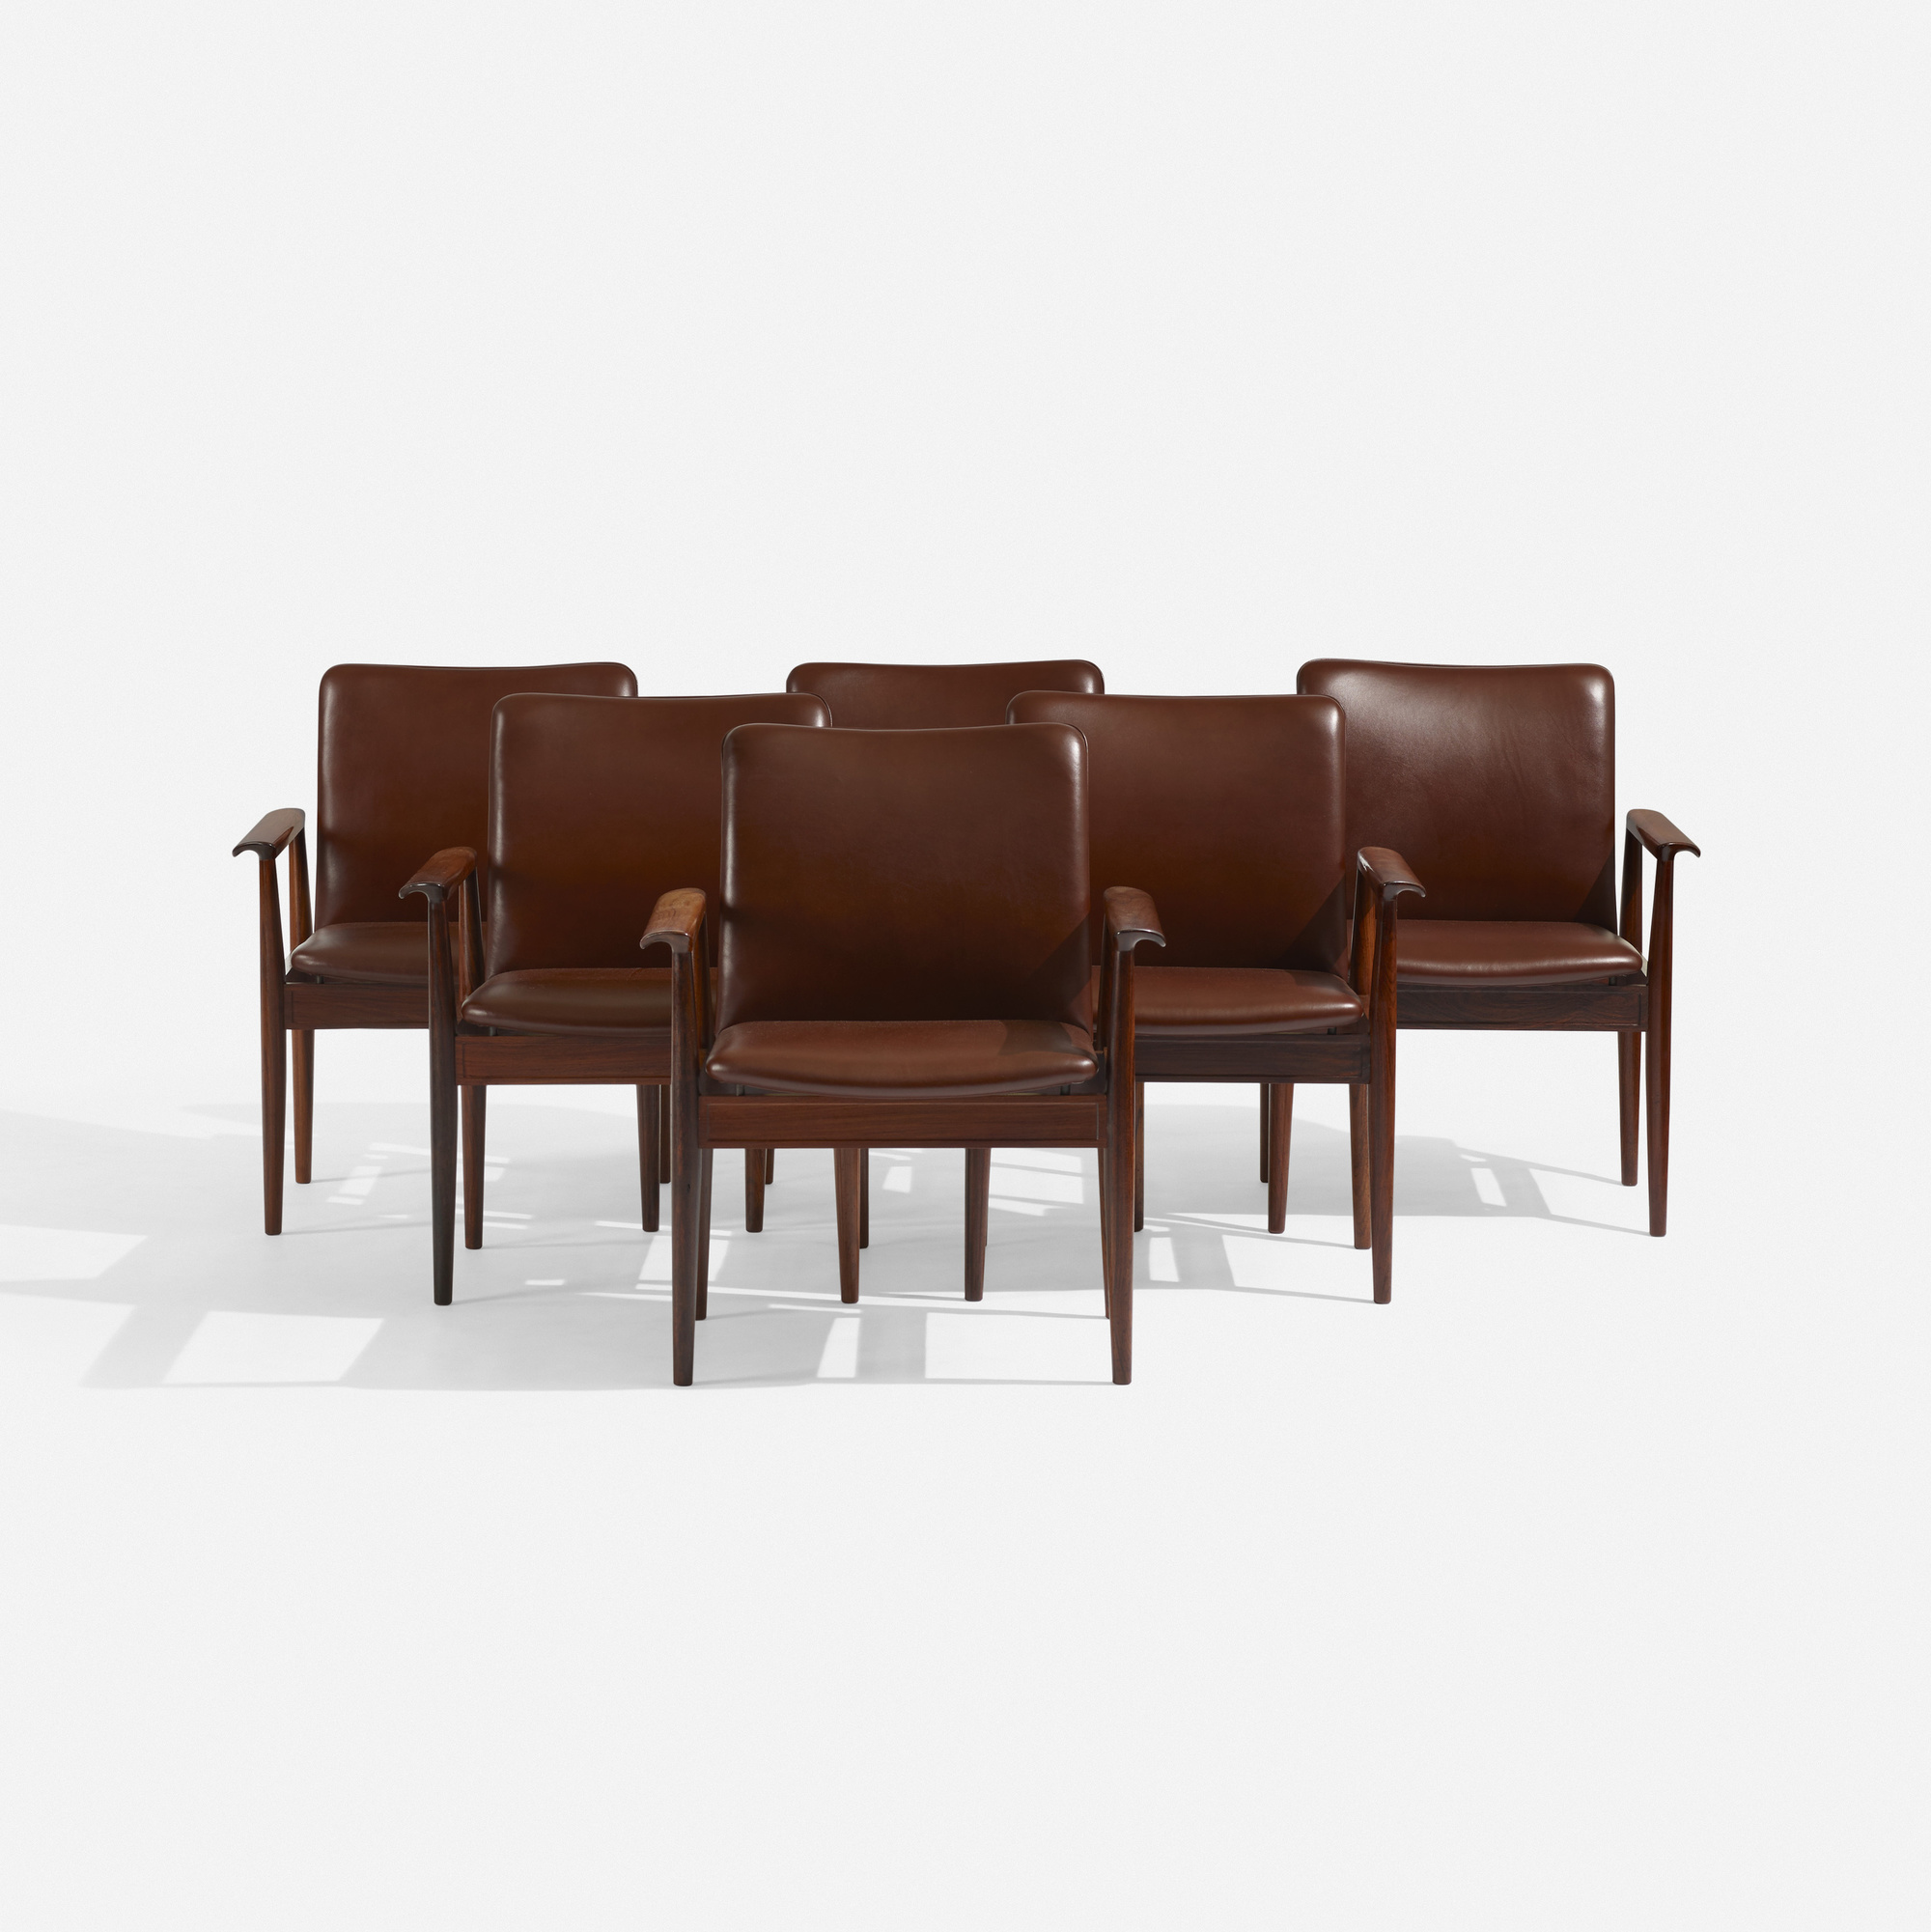 102: Finn Juhl / Diplomat armchairs, set of six (1 of 3)